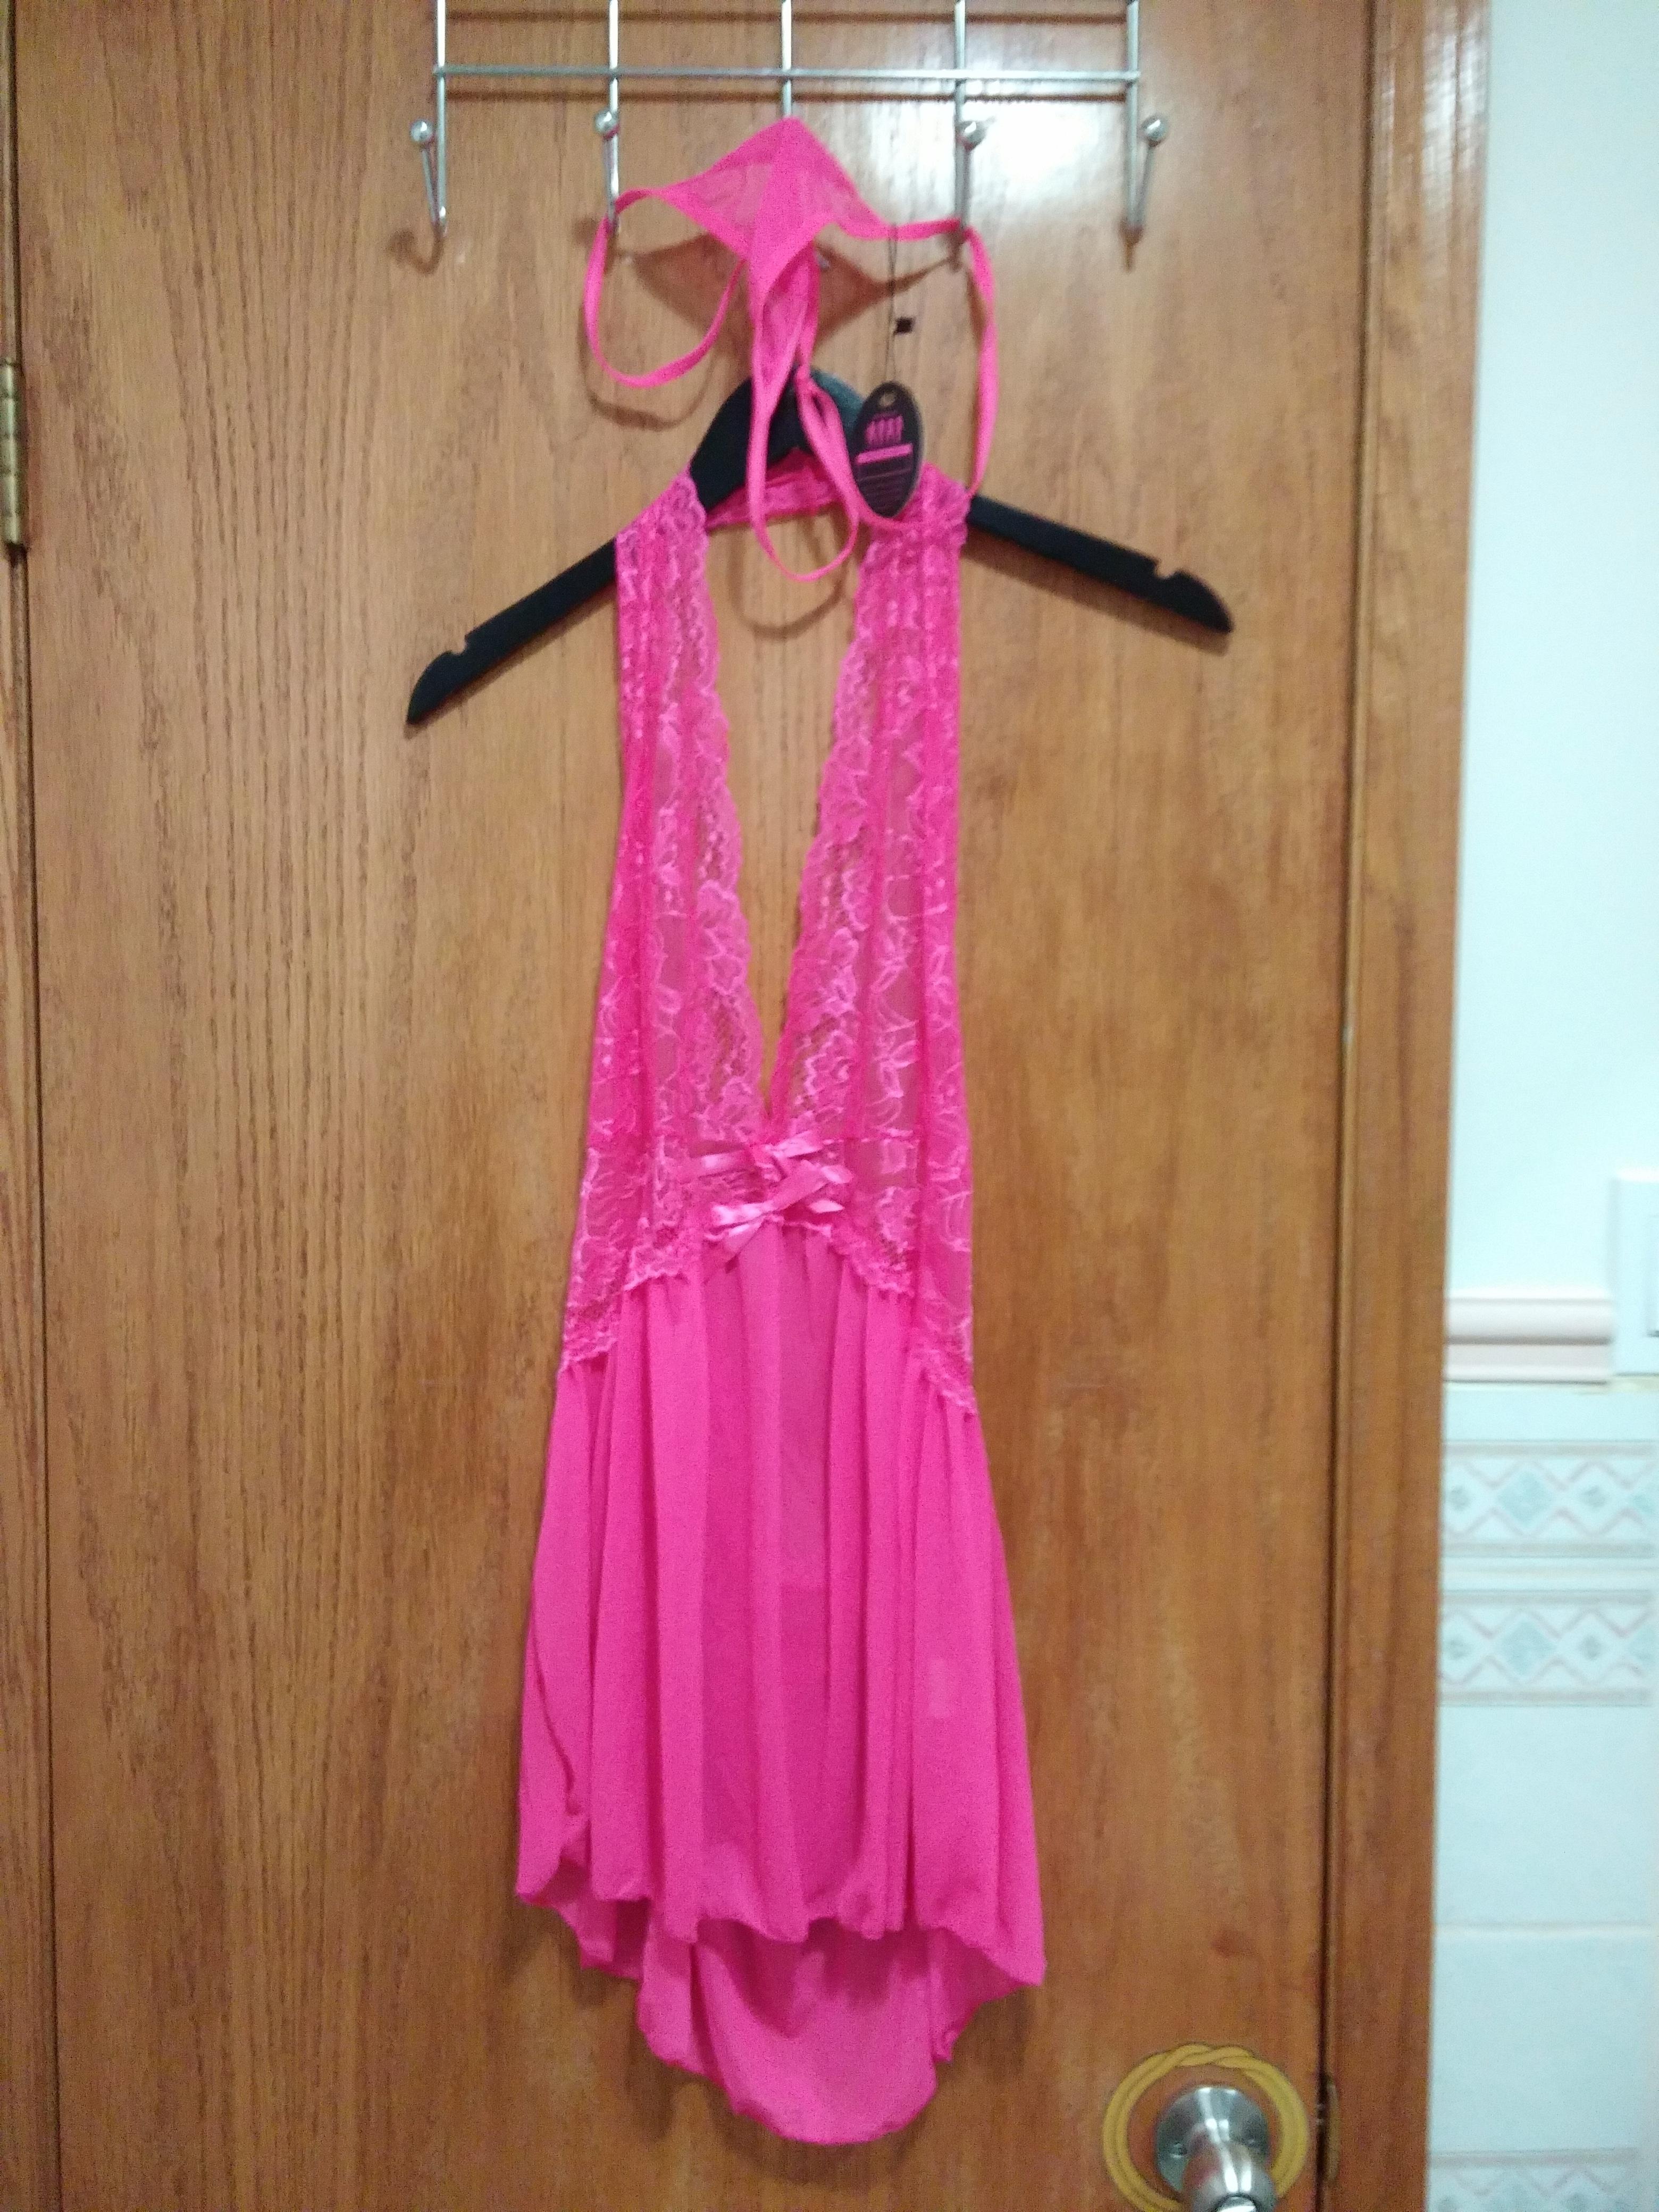 Avidlove Women Lingerie Lace Outfits Halter Babydoll